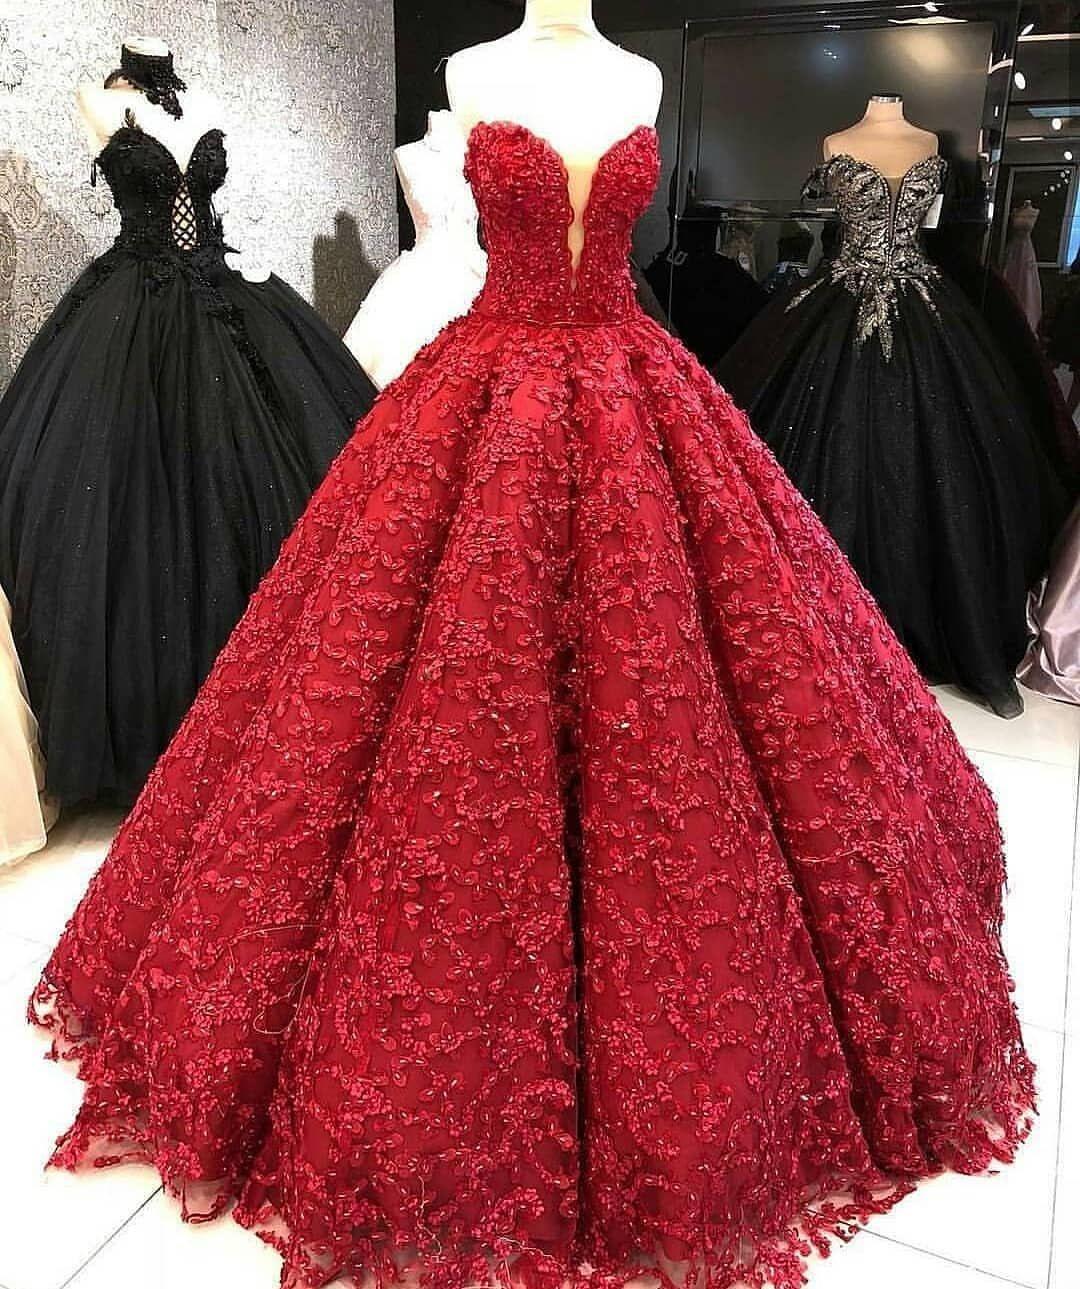 Pin by miss preety on awsm dress pinterest lover dress